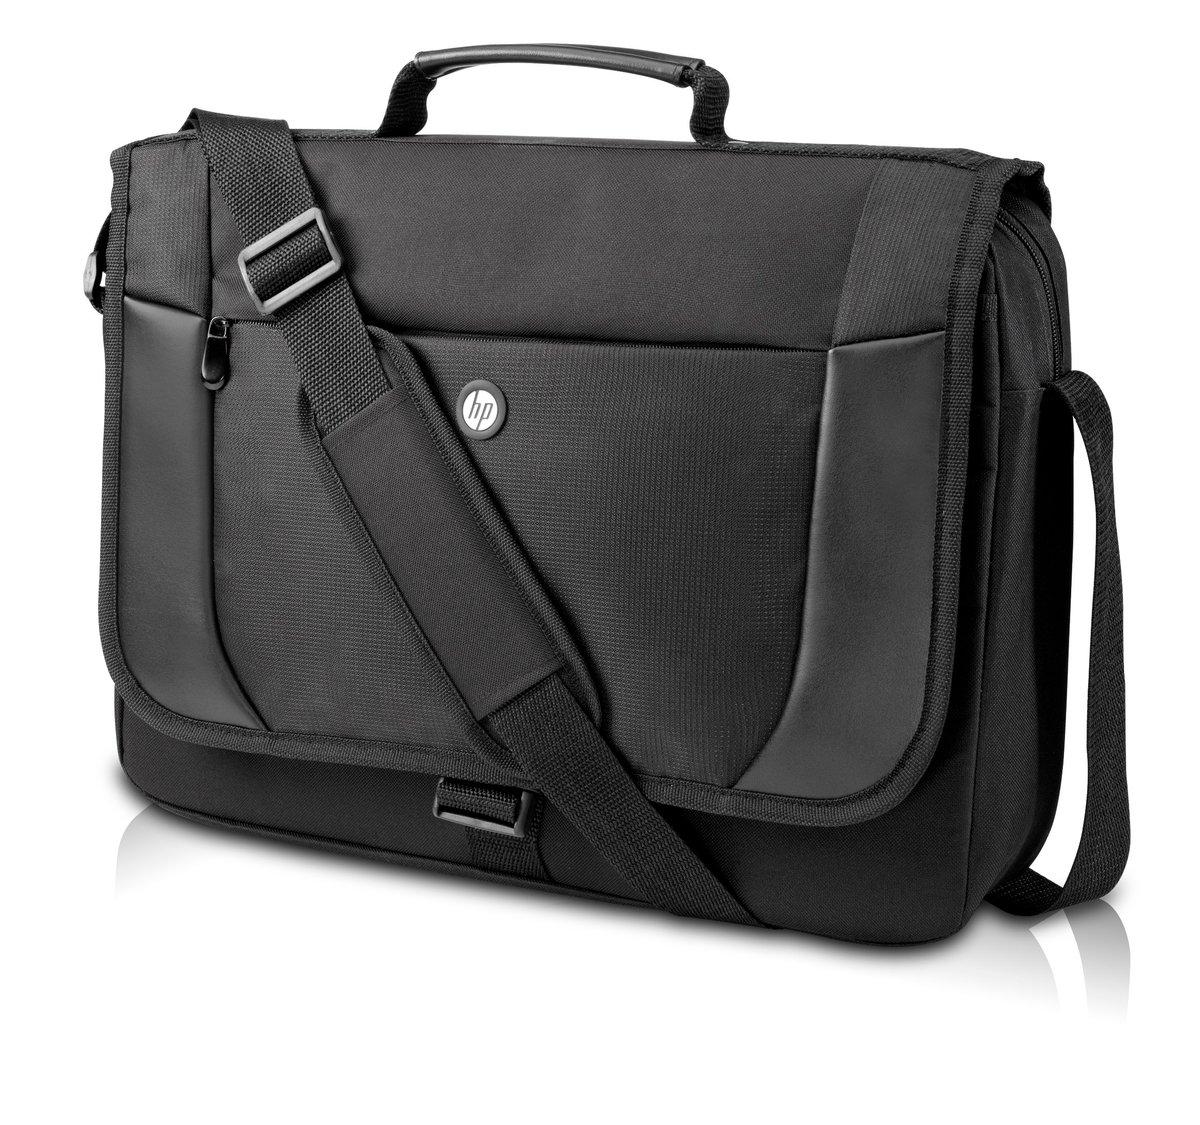 Laptop bags office depot - Slide 1 Of 1 Show Larger Image Hp Essential Messenger Case